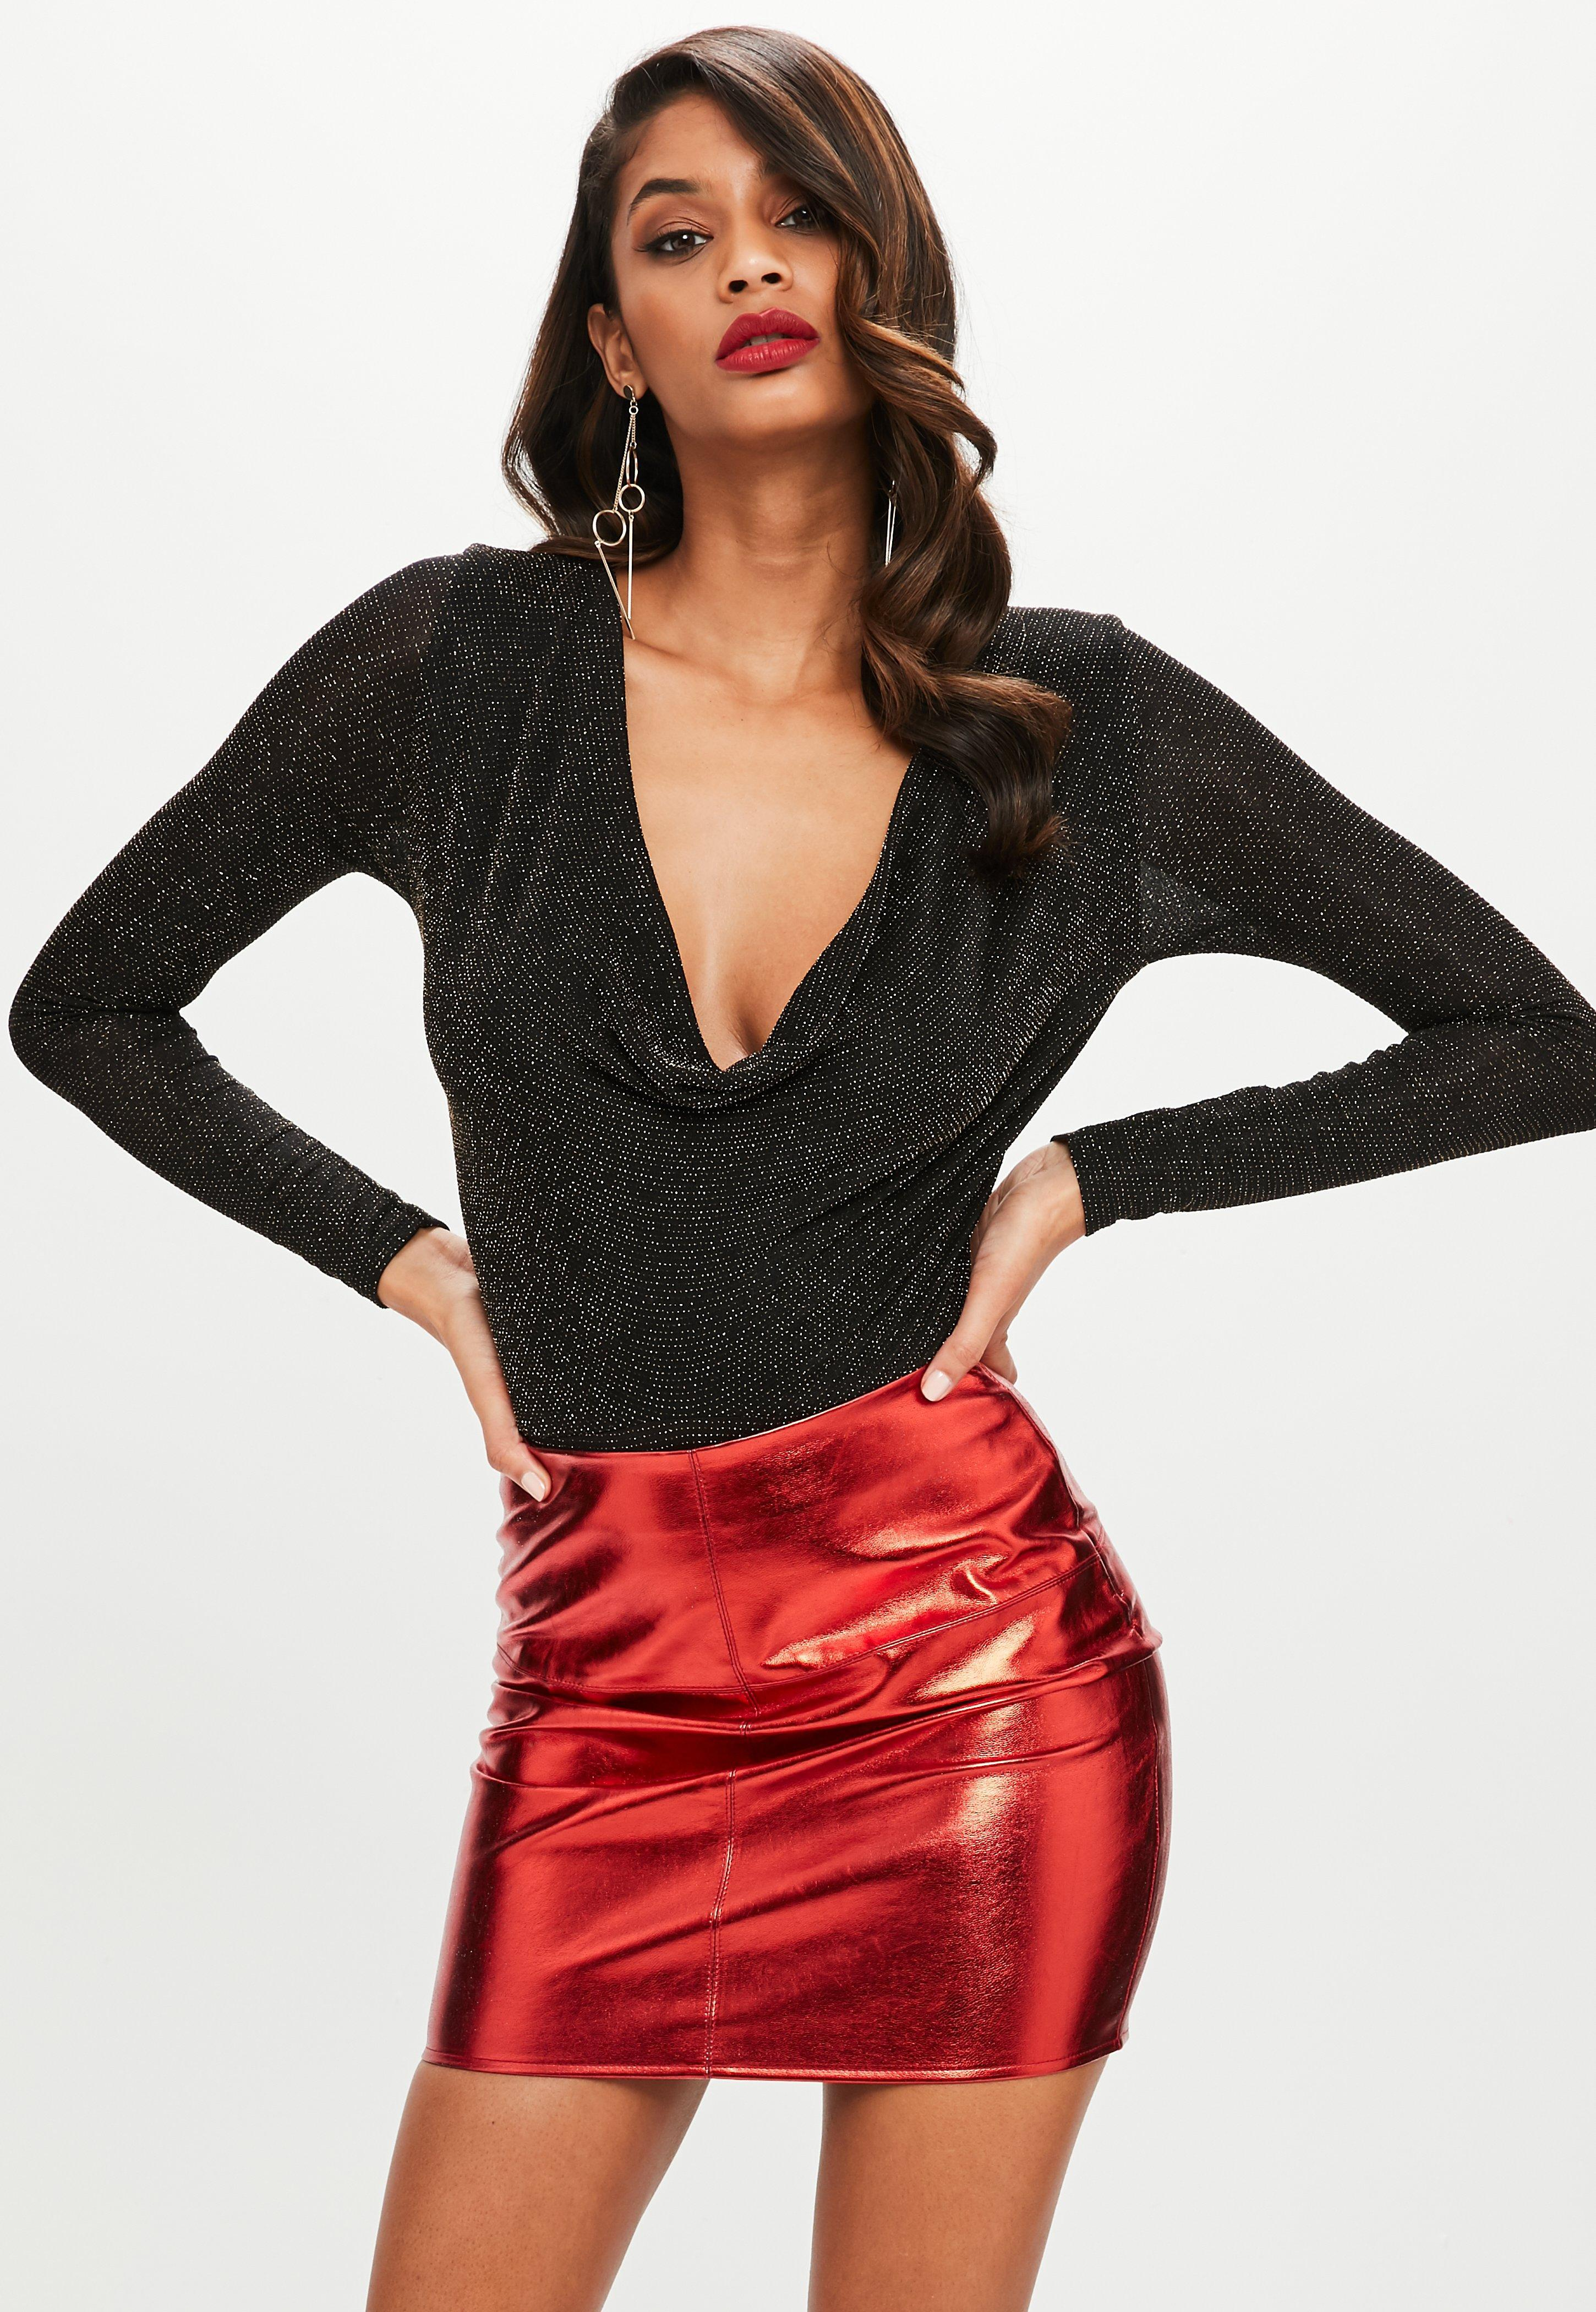 7f040a97c3 Missguided Black Cowl Neck Long Sleeve Glitter Bodysuit in Black - Lyst